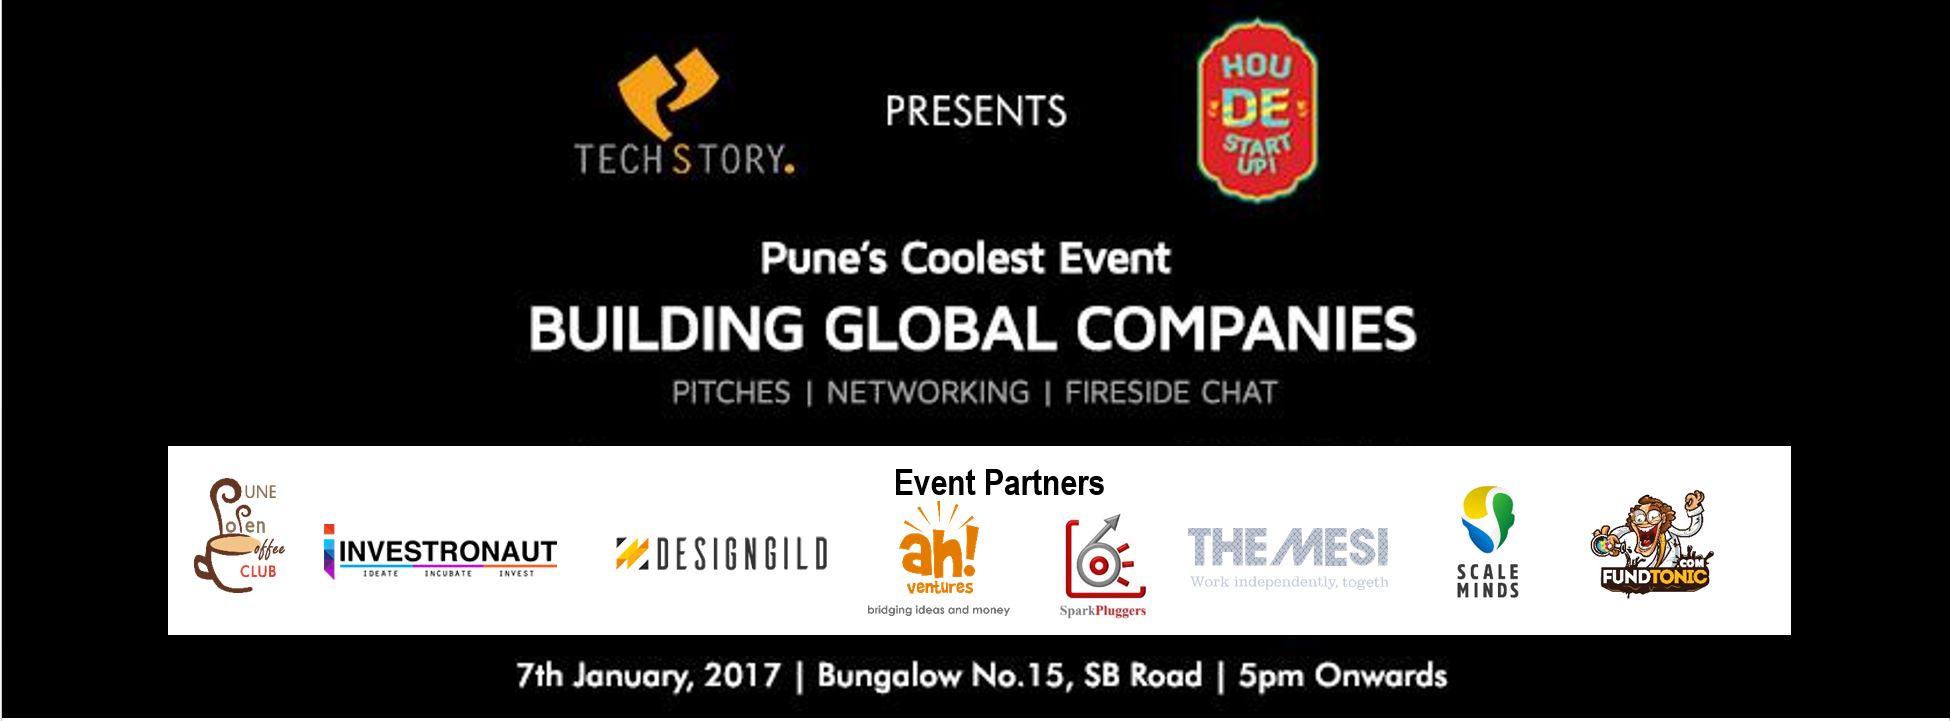 Hou De Startup - Pune's Coolest Startup Event ! - Explara